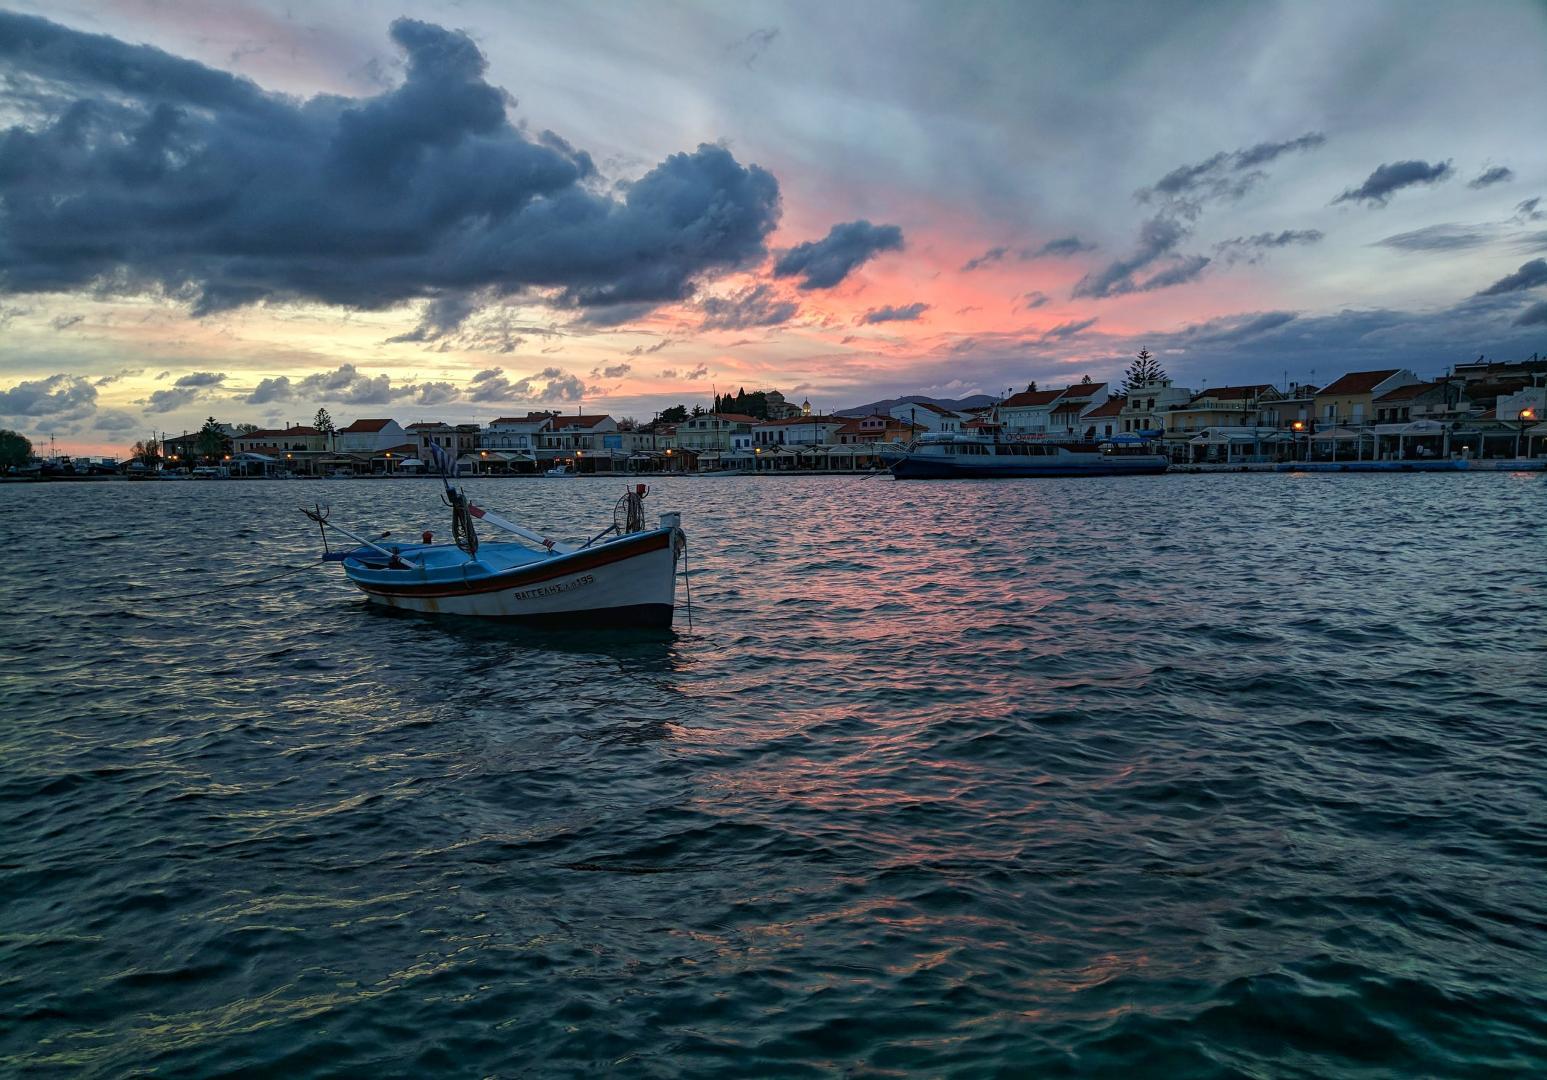 Photo by Fotis Fotopoulos on Unsplash